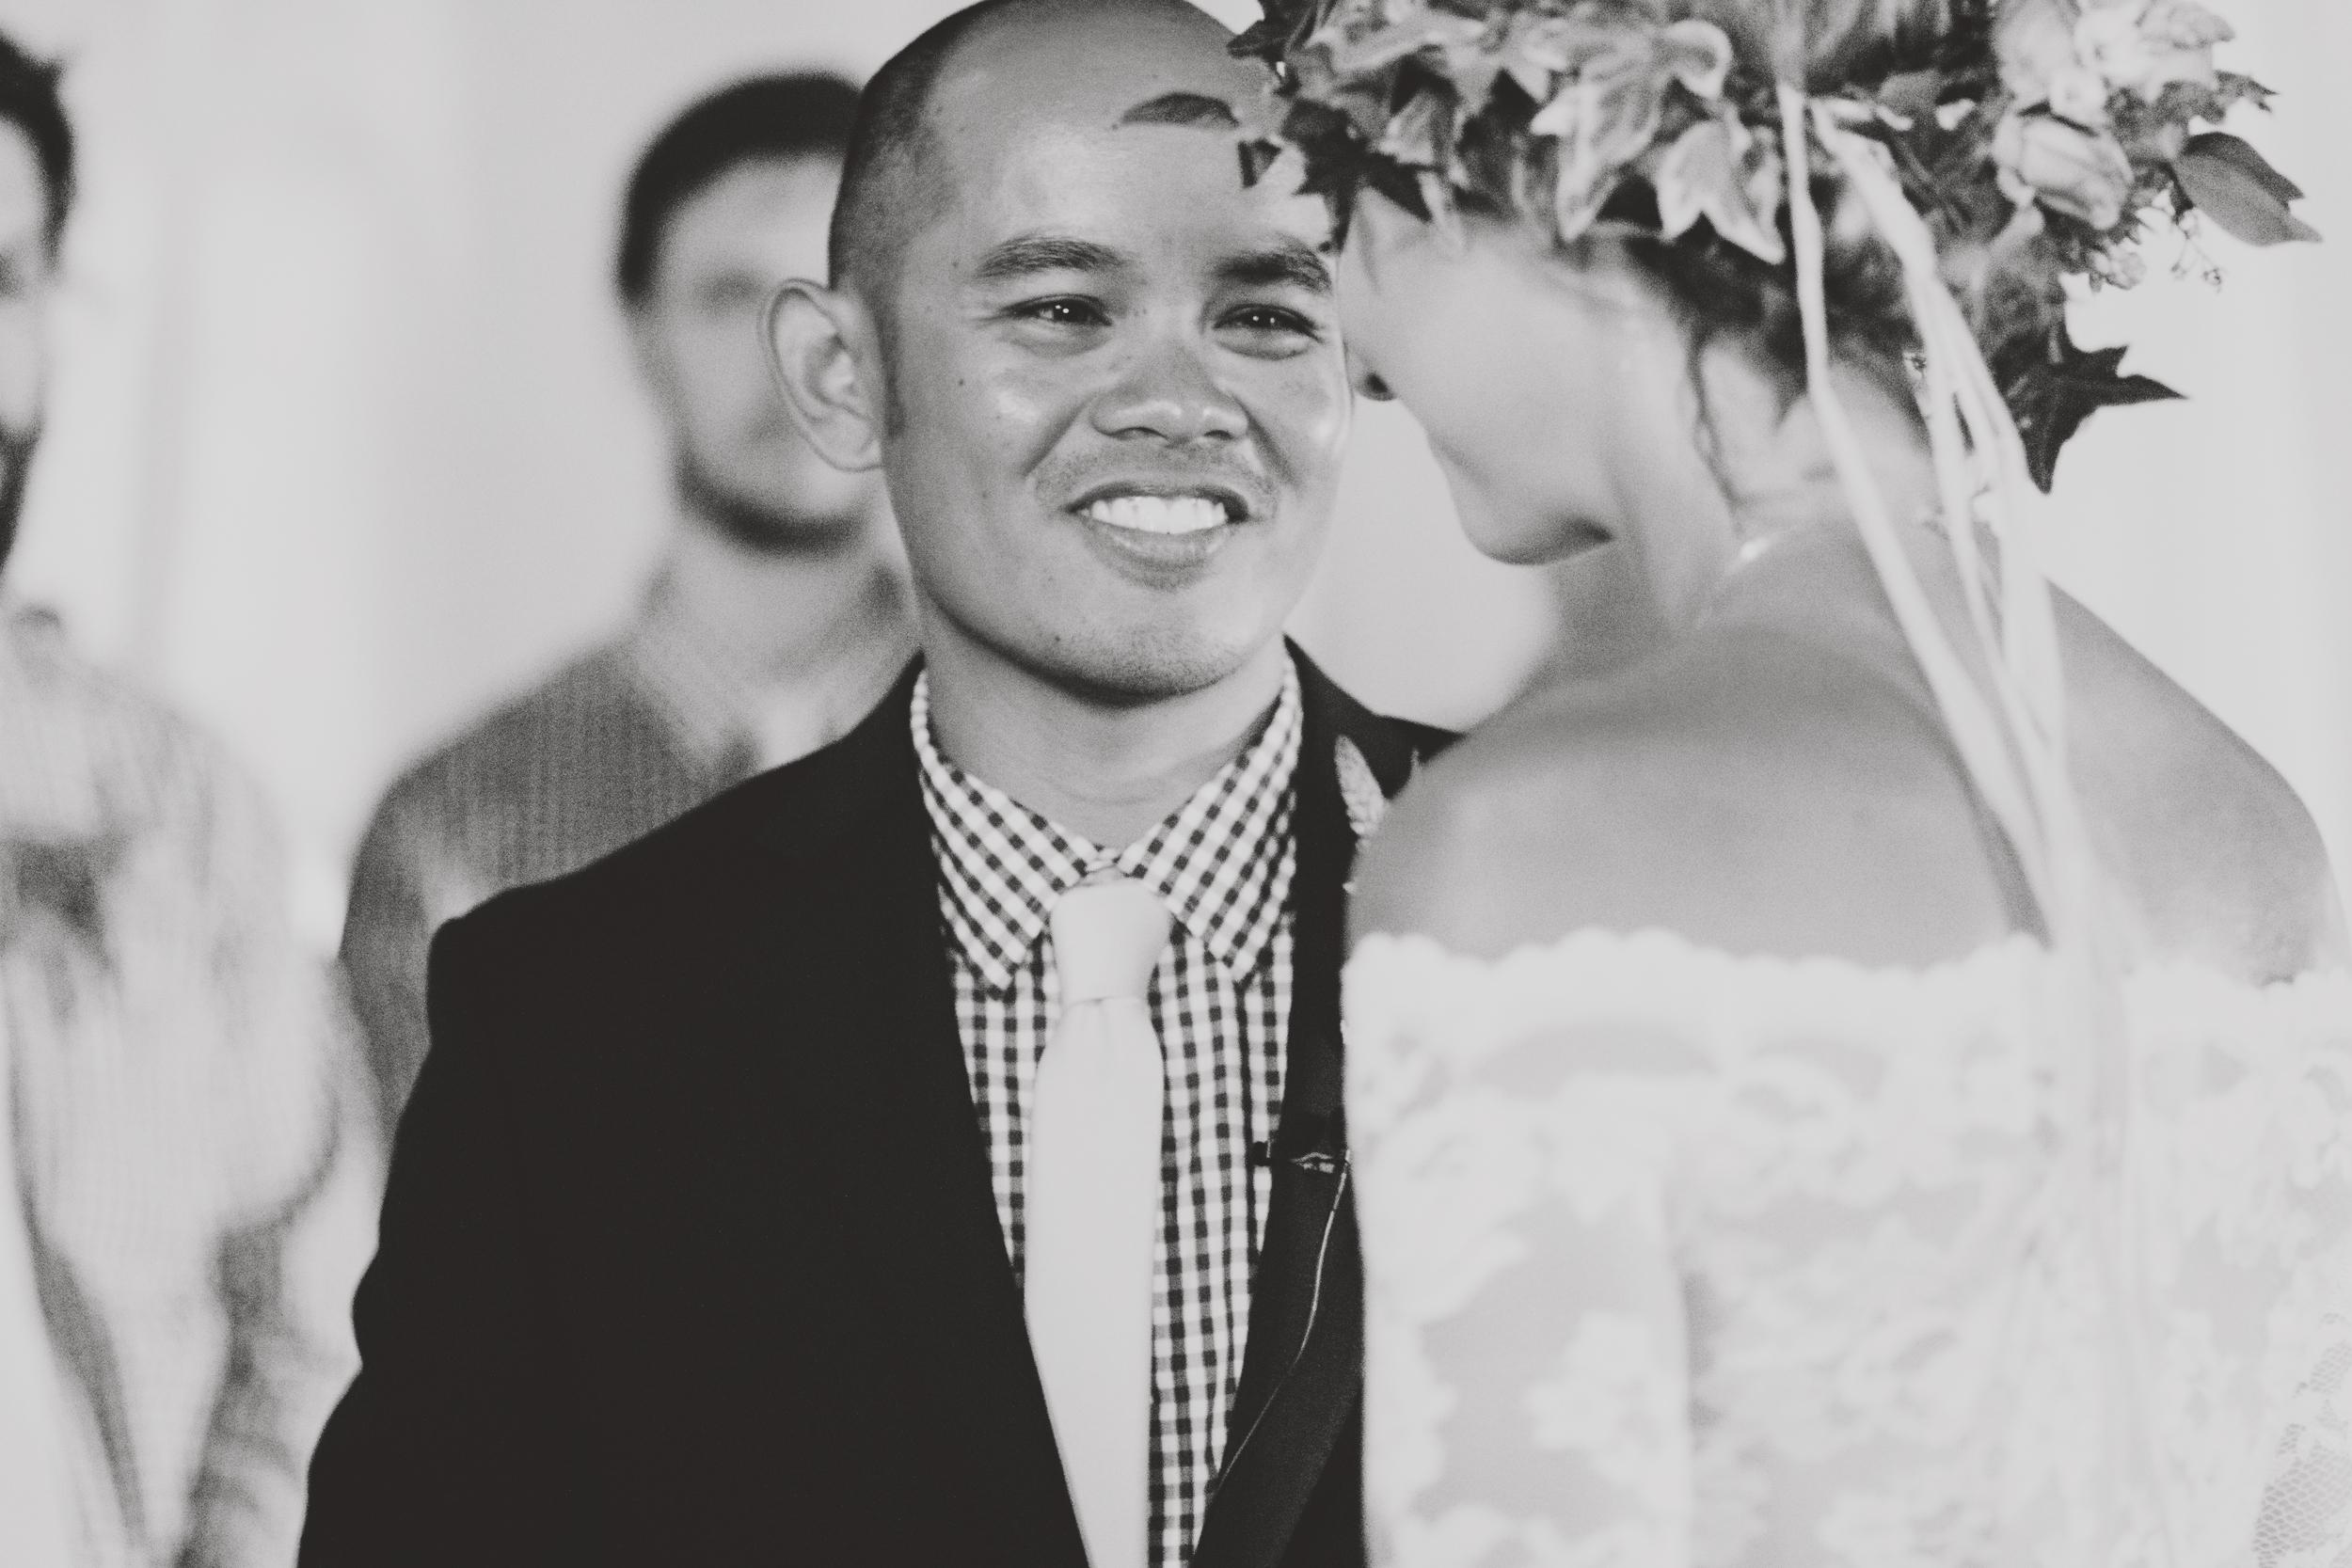 angie-diaz-photography-oahu-hawaii-wedding-tradewinds-ranch-60.jpg